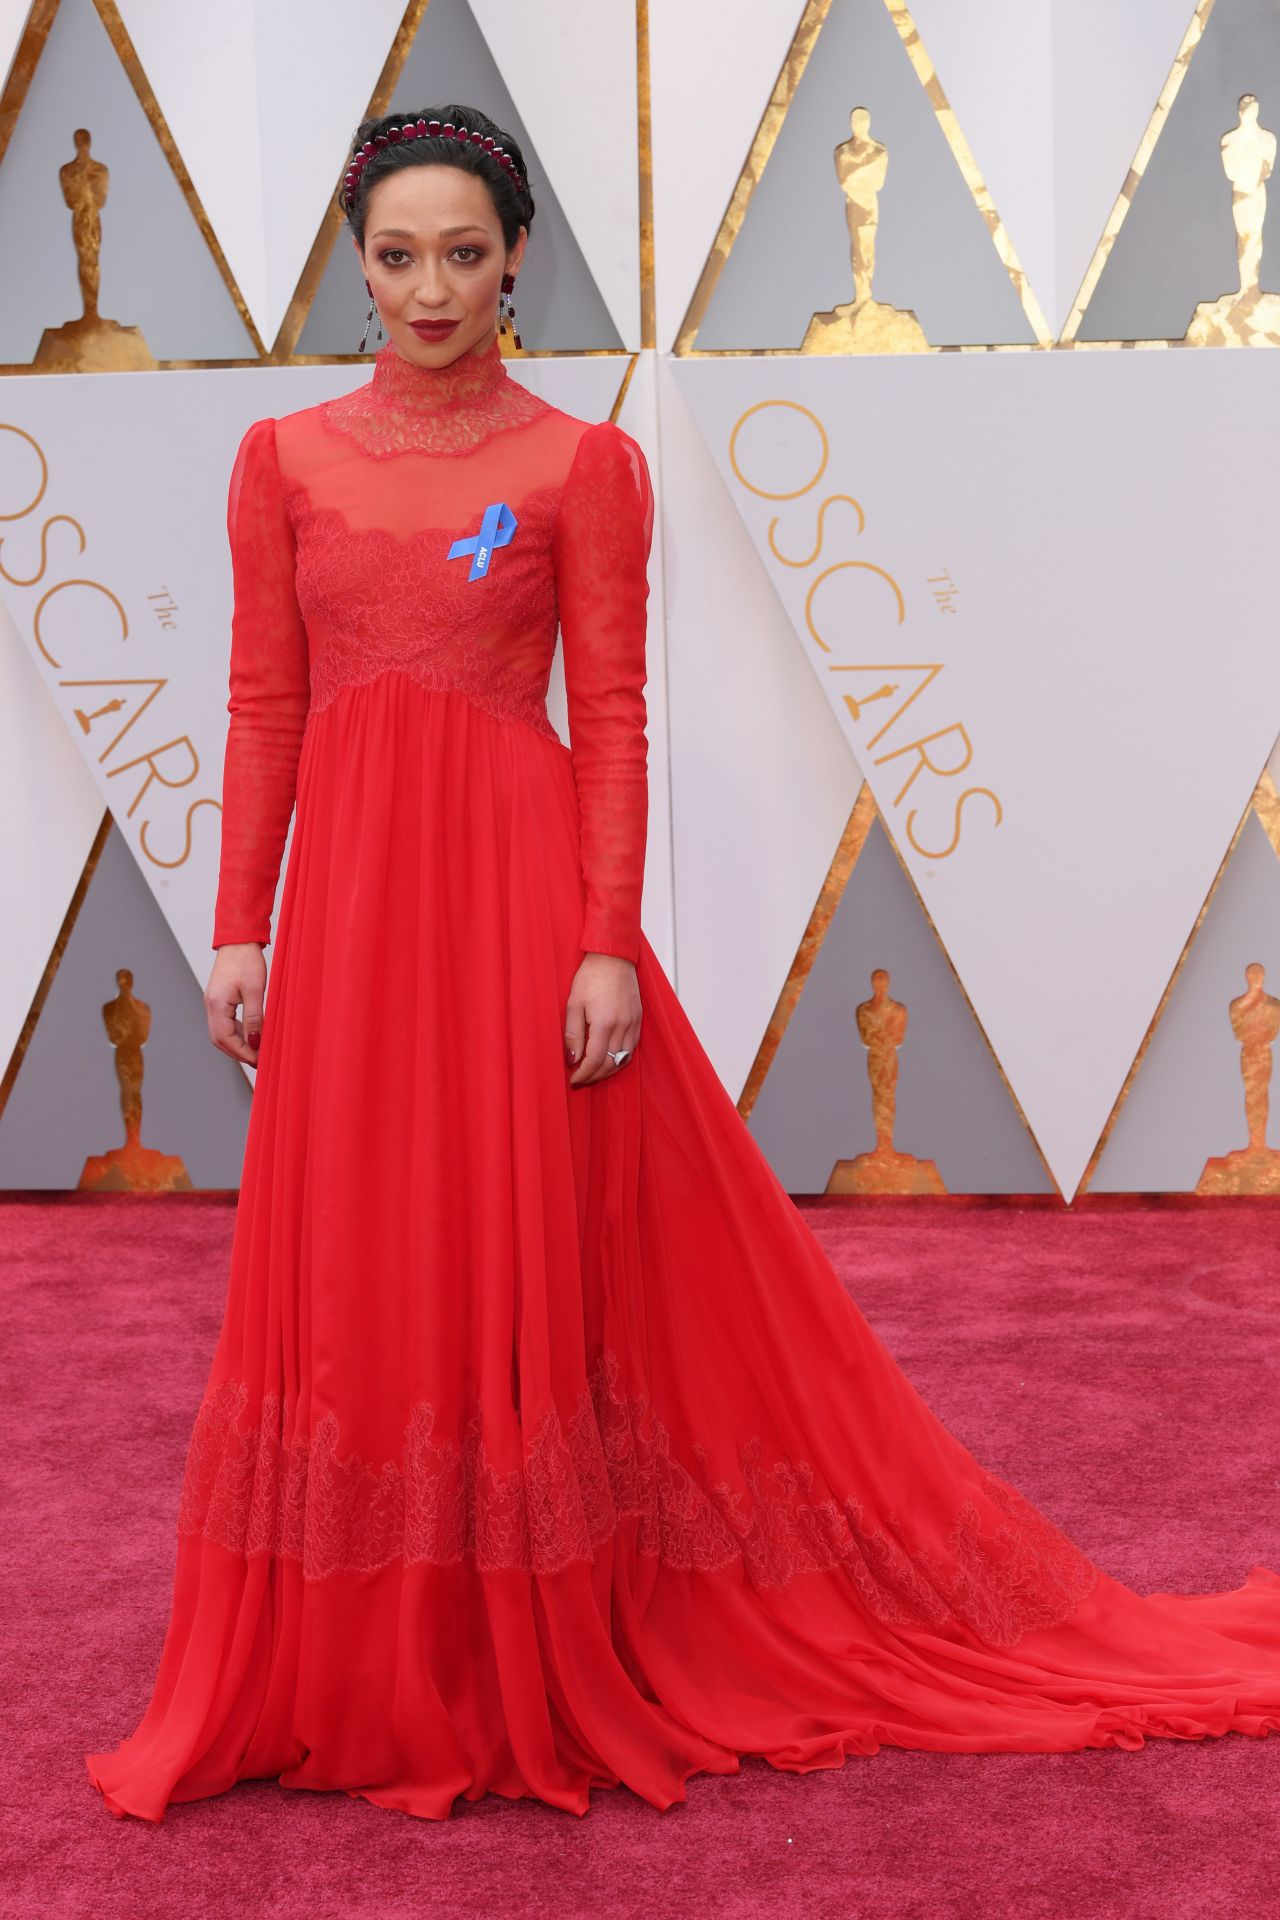 Ruth Negga Oscars 2017 Red Carpet In Hollywood